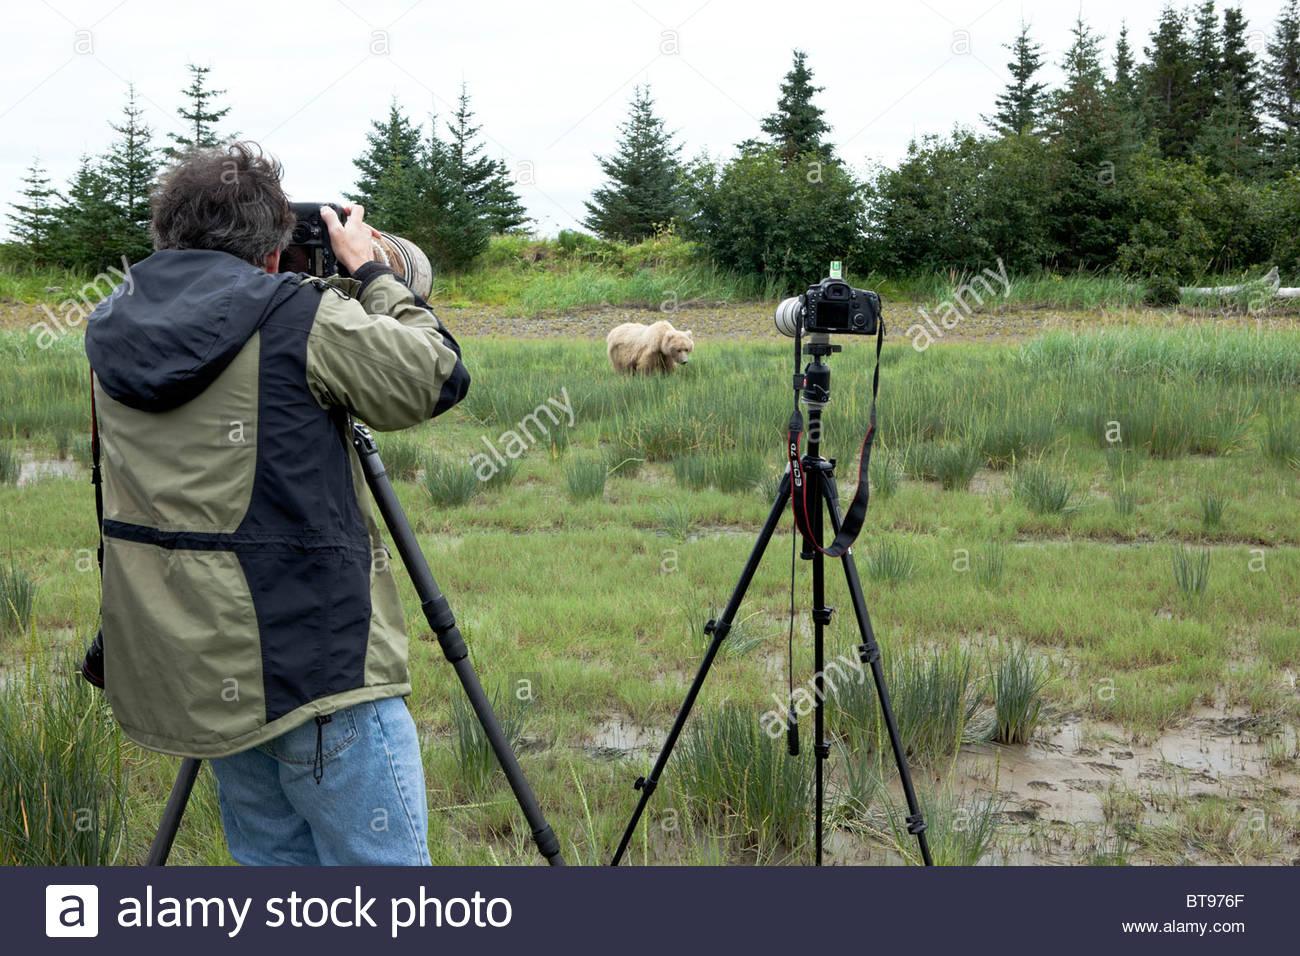 Alaskan Wildlife Photographer, Ron Niebrugge Photographing Grizzly Bear, Lake Clark National Park, Alaska - Stock Image